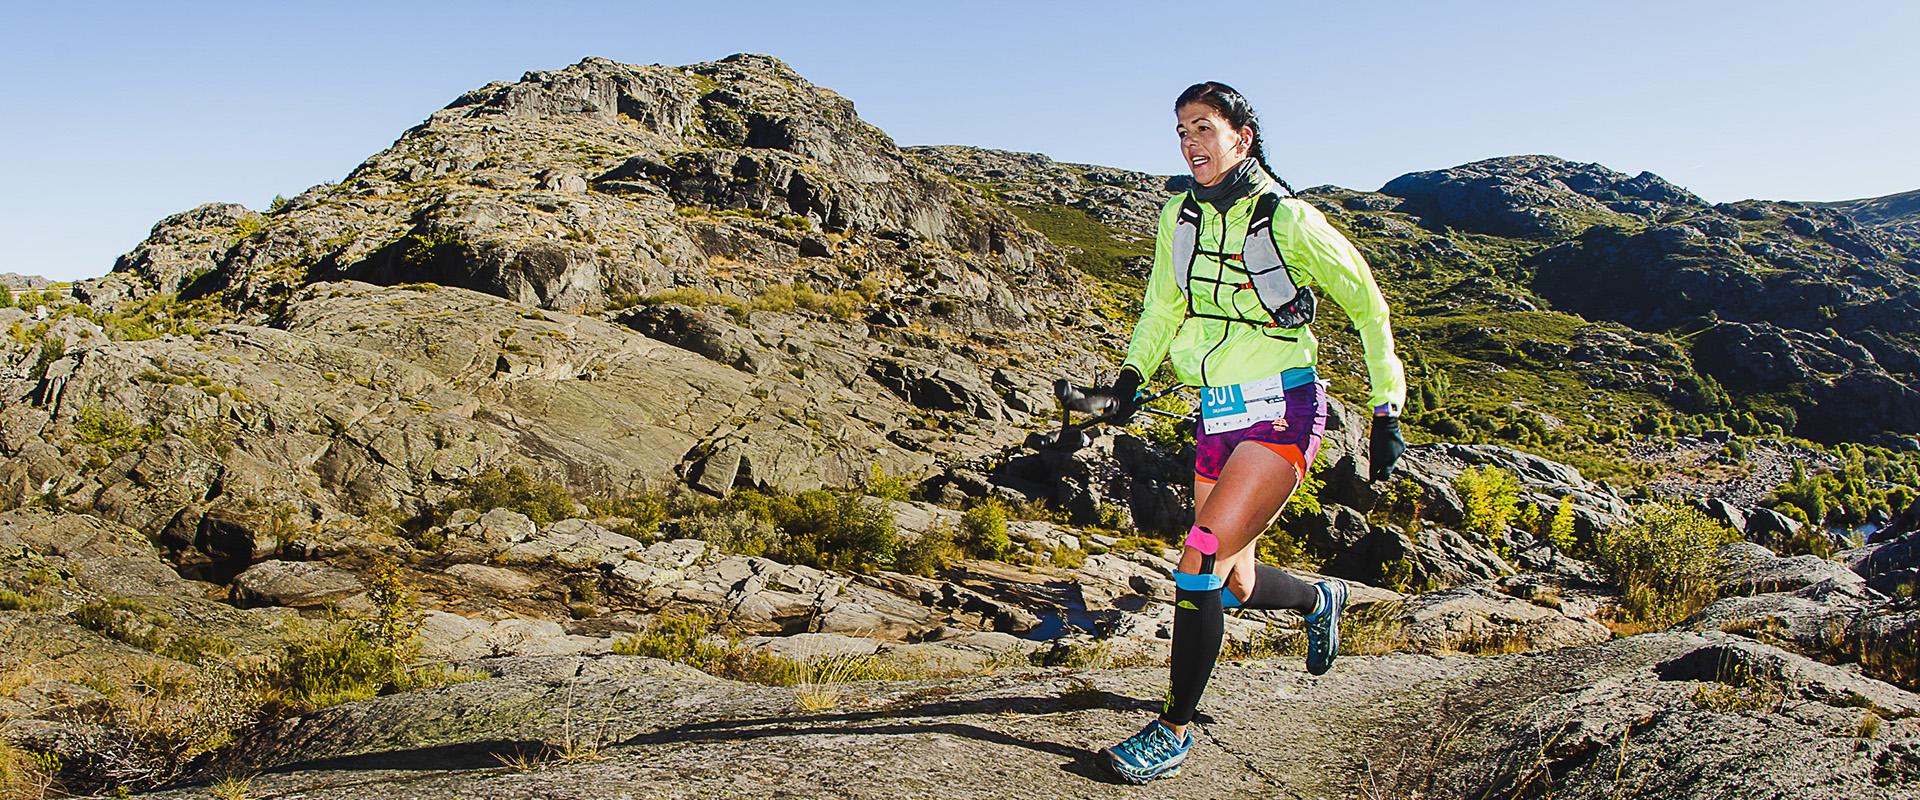 Desafíos Bike and Trail - Trail - Ultra Sanabria